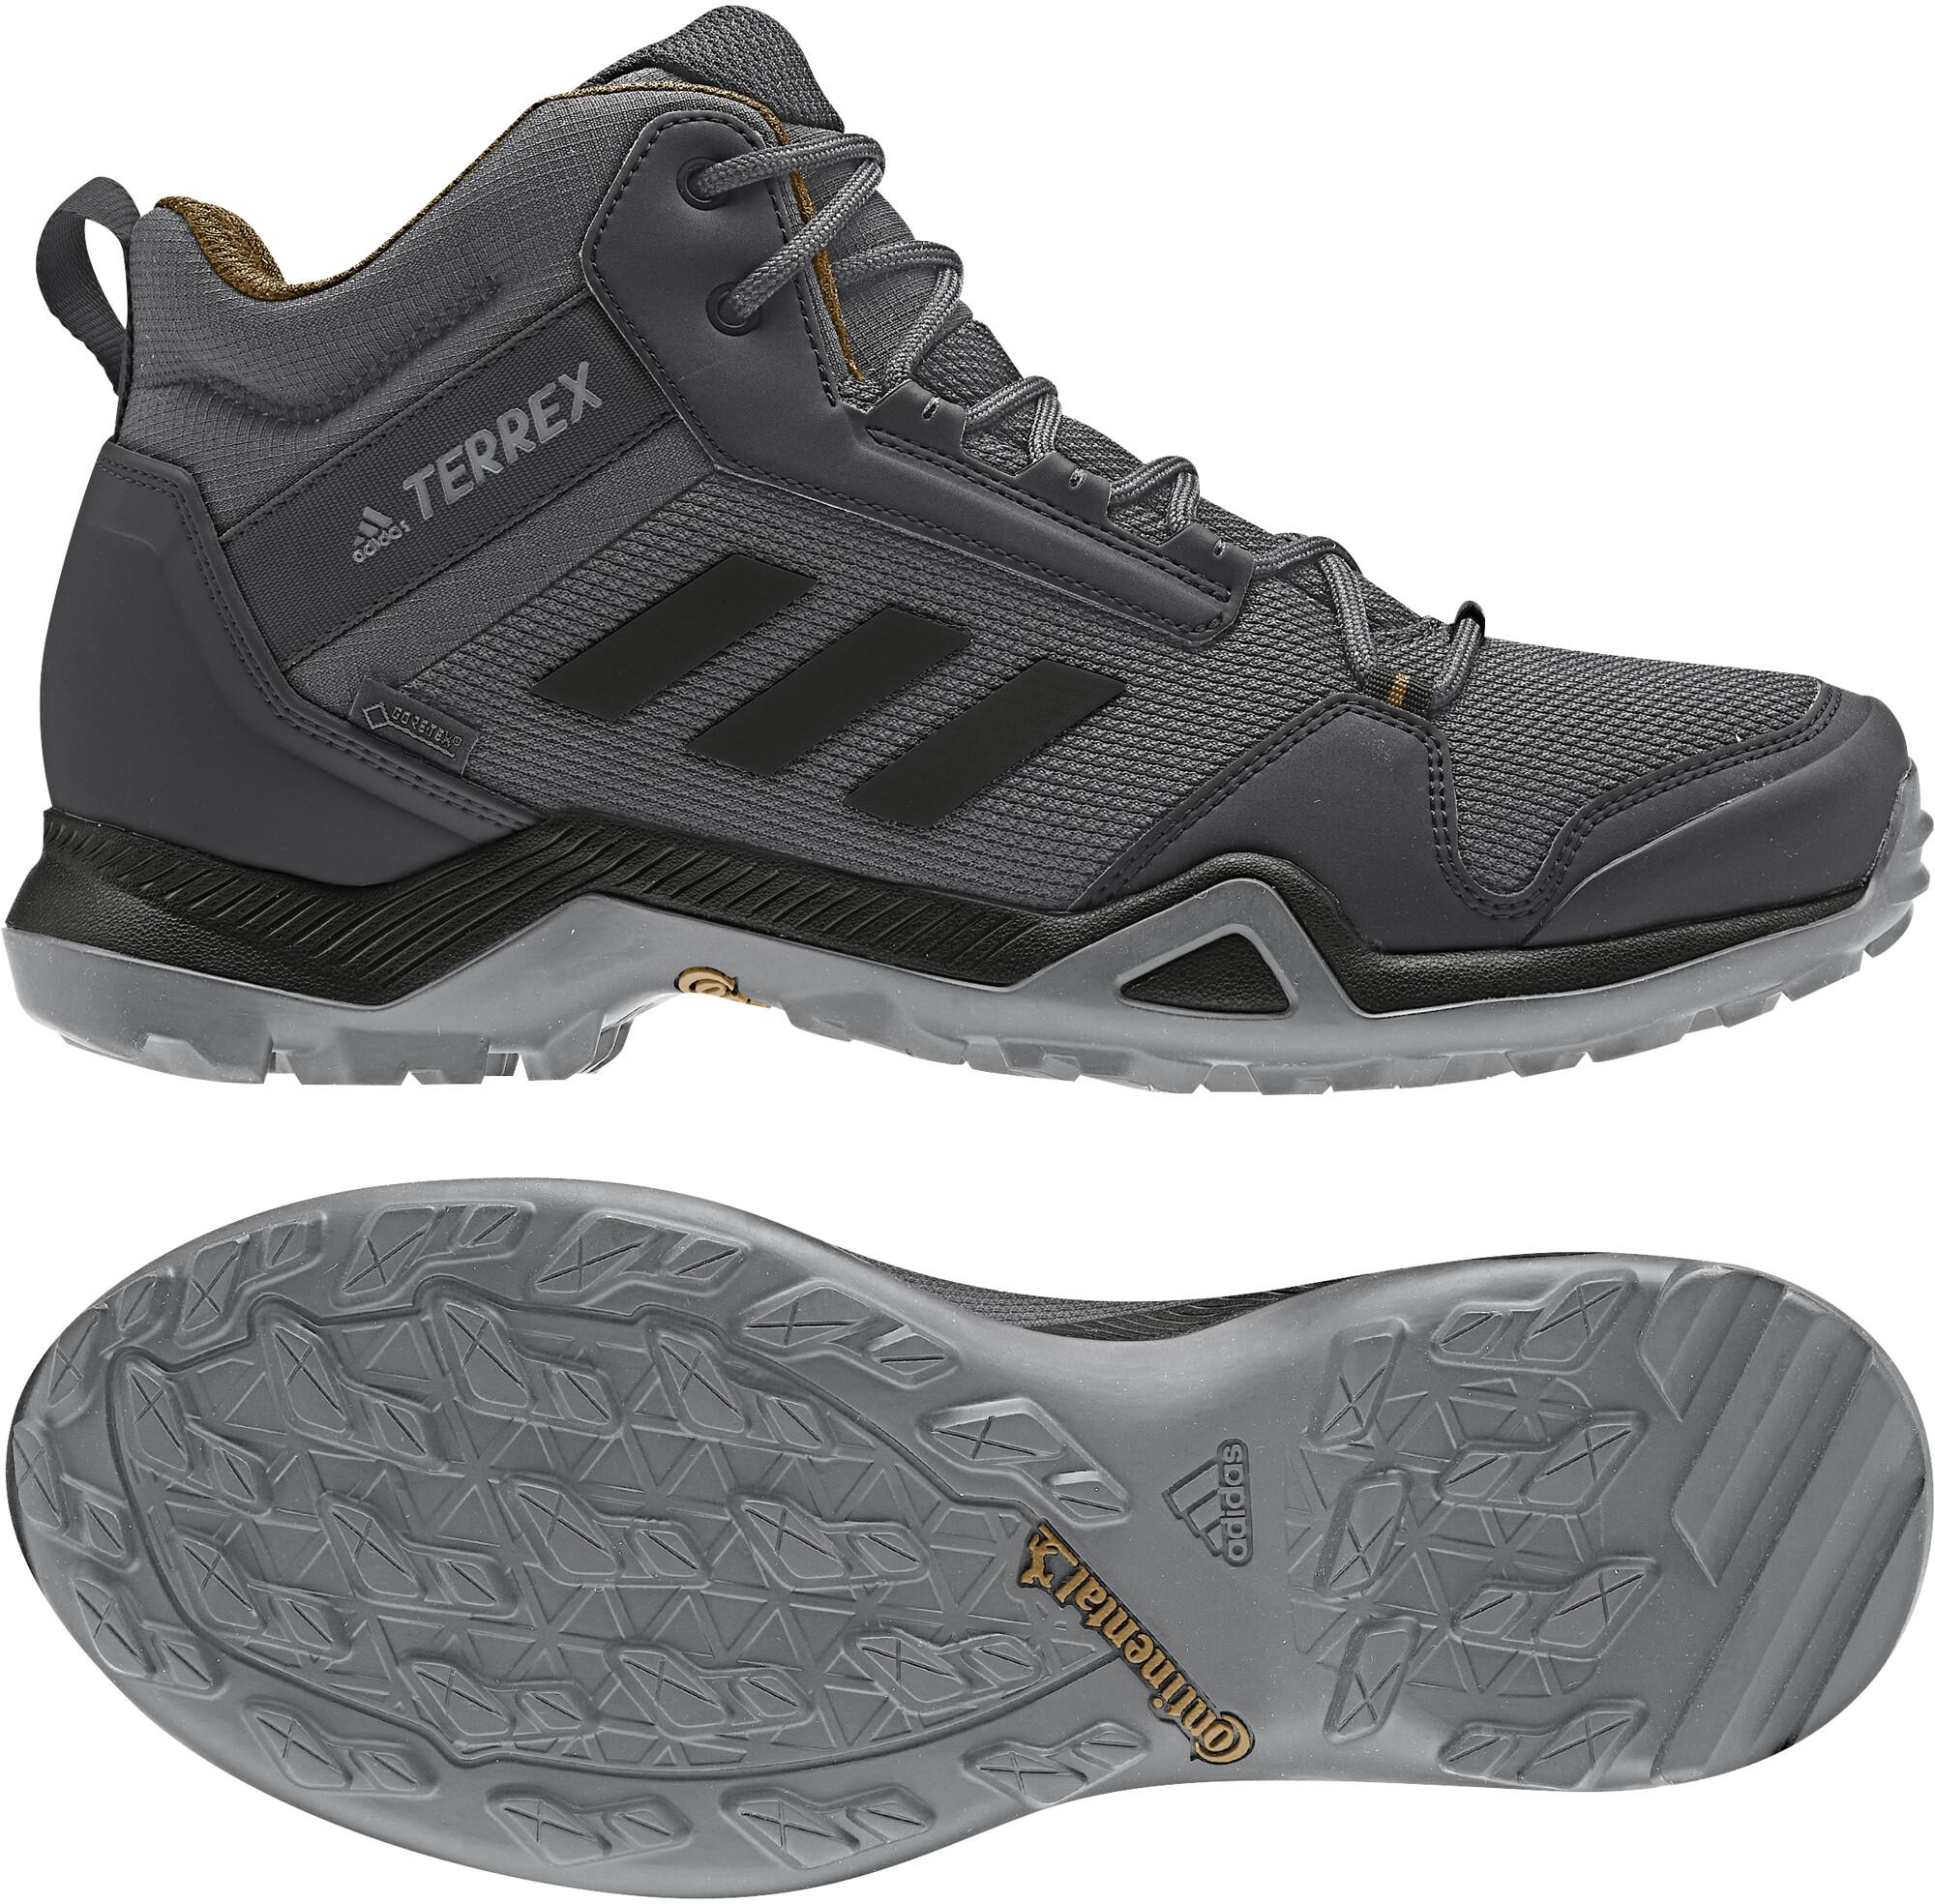 partes ayudar Campeonato  adidas TERREX AX3 Mid Gore-Tex Hiking Shoes Waterproof Men grey five/core  black/mesa at addnature.co.uk